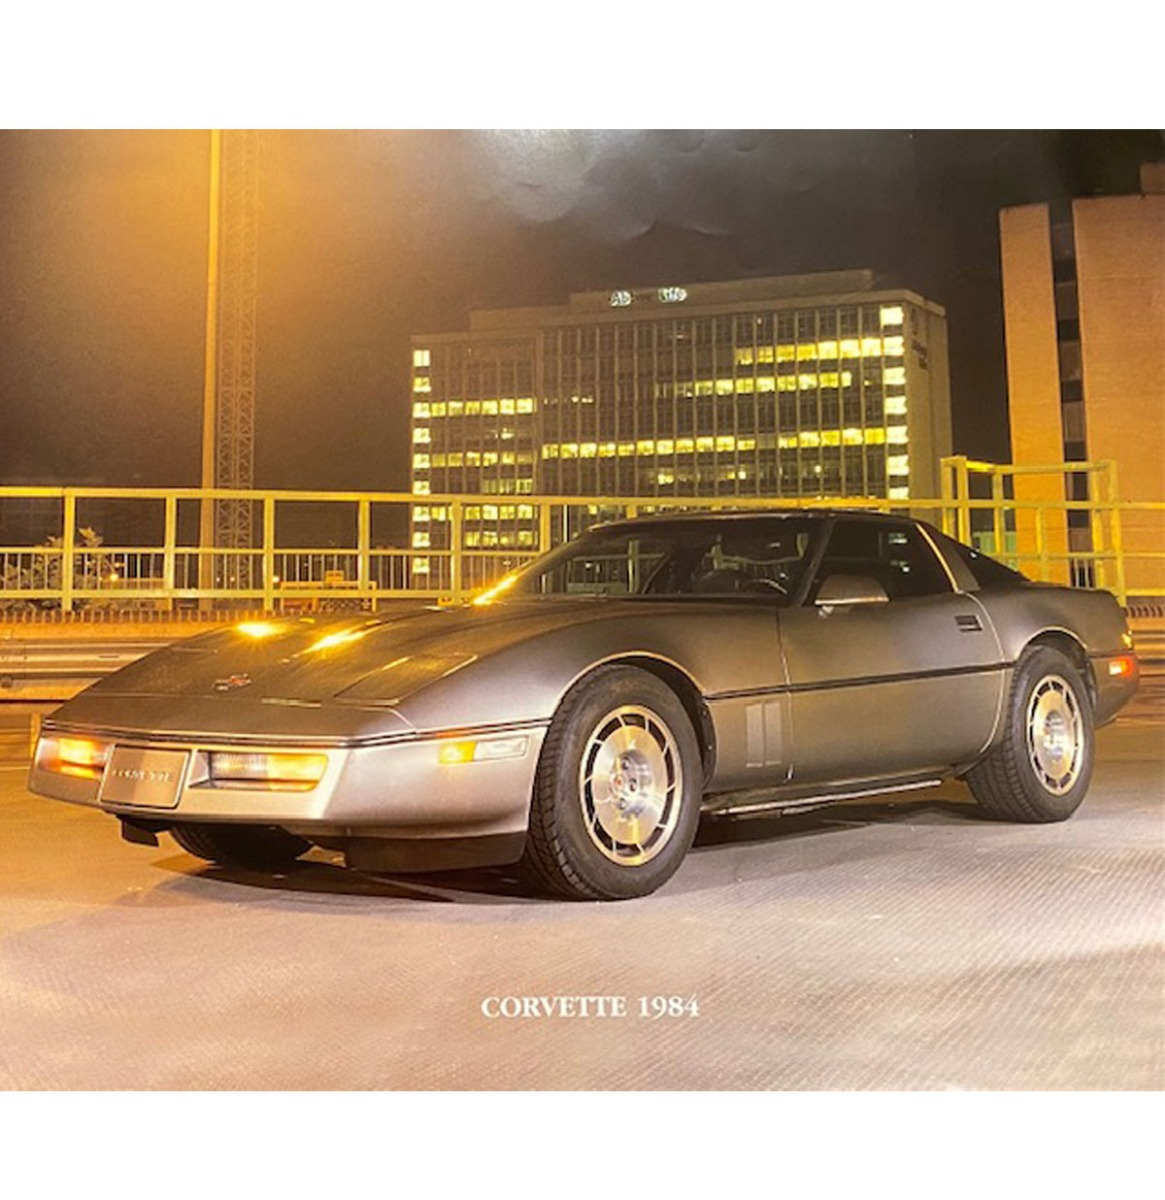 Auto Poster Corvette 1984 40x50cm